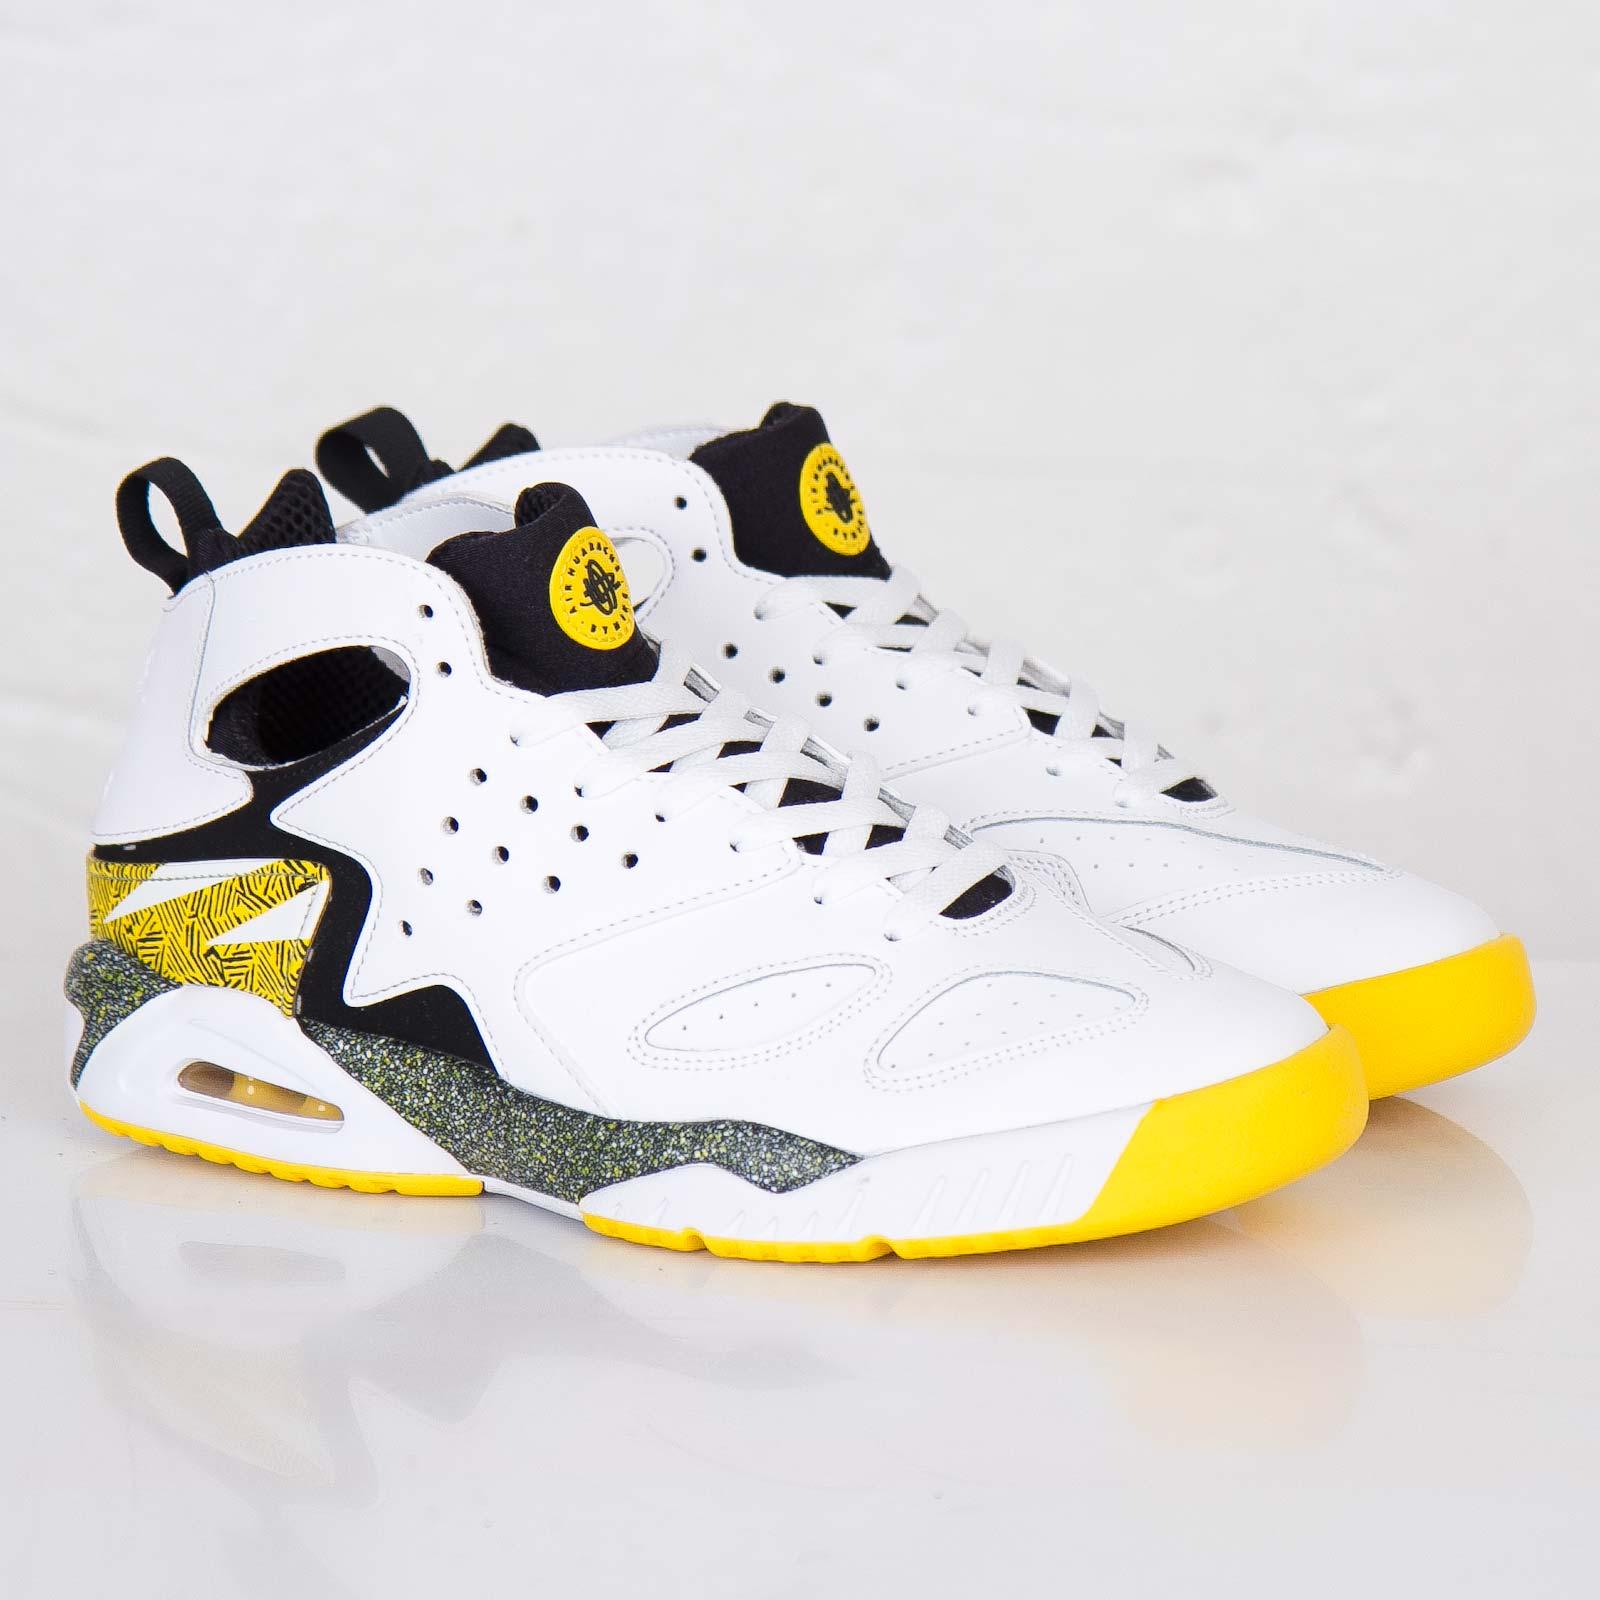 b0f94922823 Nike Air Tech Challenge Huarache - 630957-100 - Sneakersnstuff ...